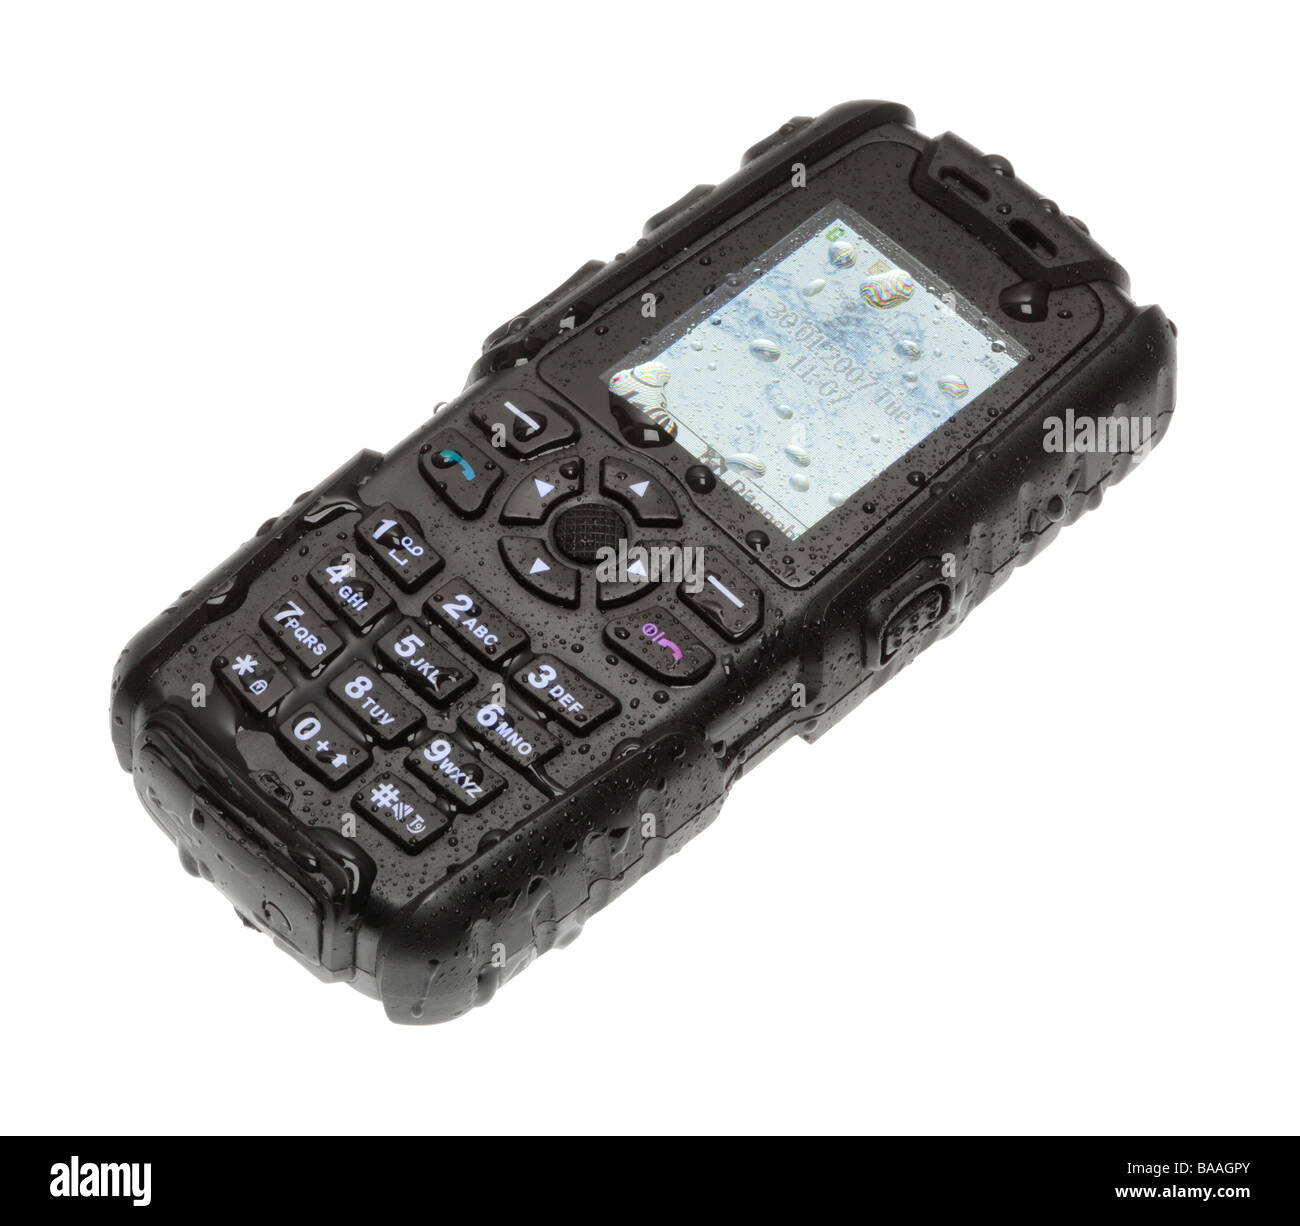 Wet waterproof mobile phone - Stock Image